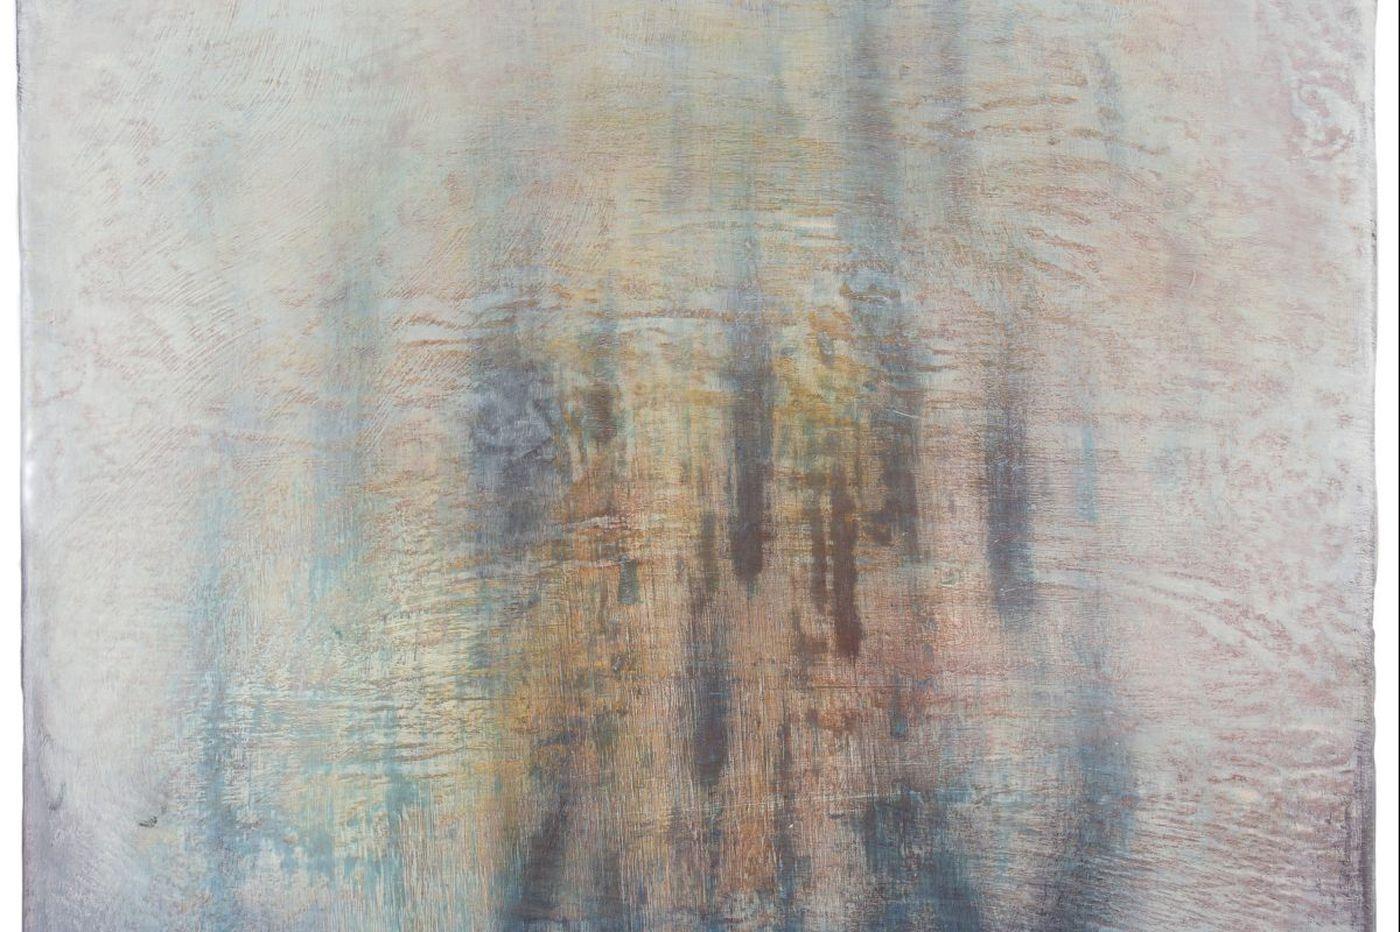 In Philly galleries this March: Neysa Grassi, Lynda Benglis, Kazimira Rachfal, Robert Younger